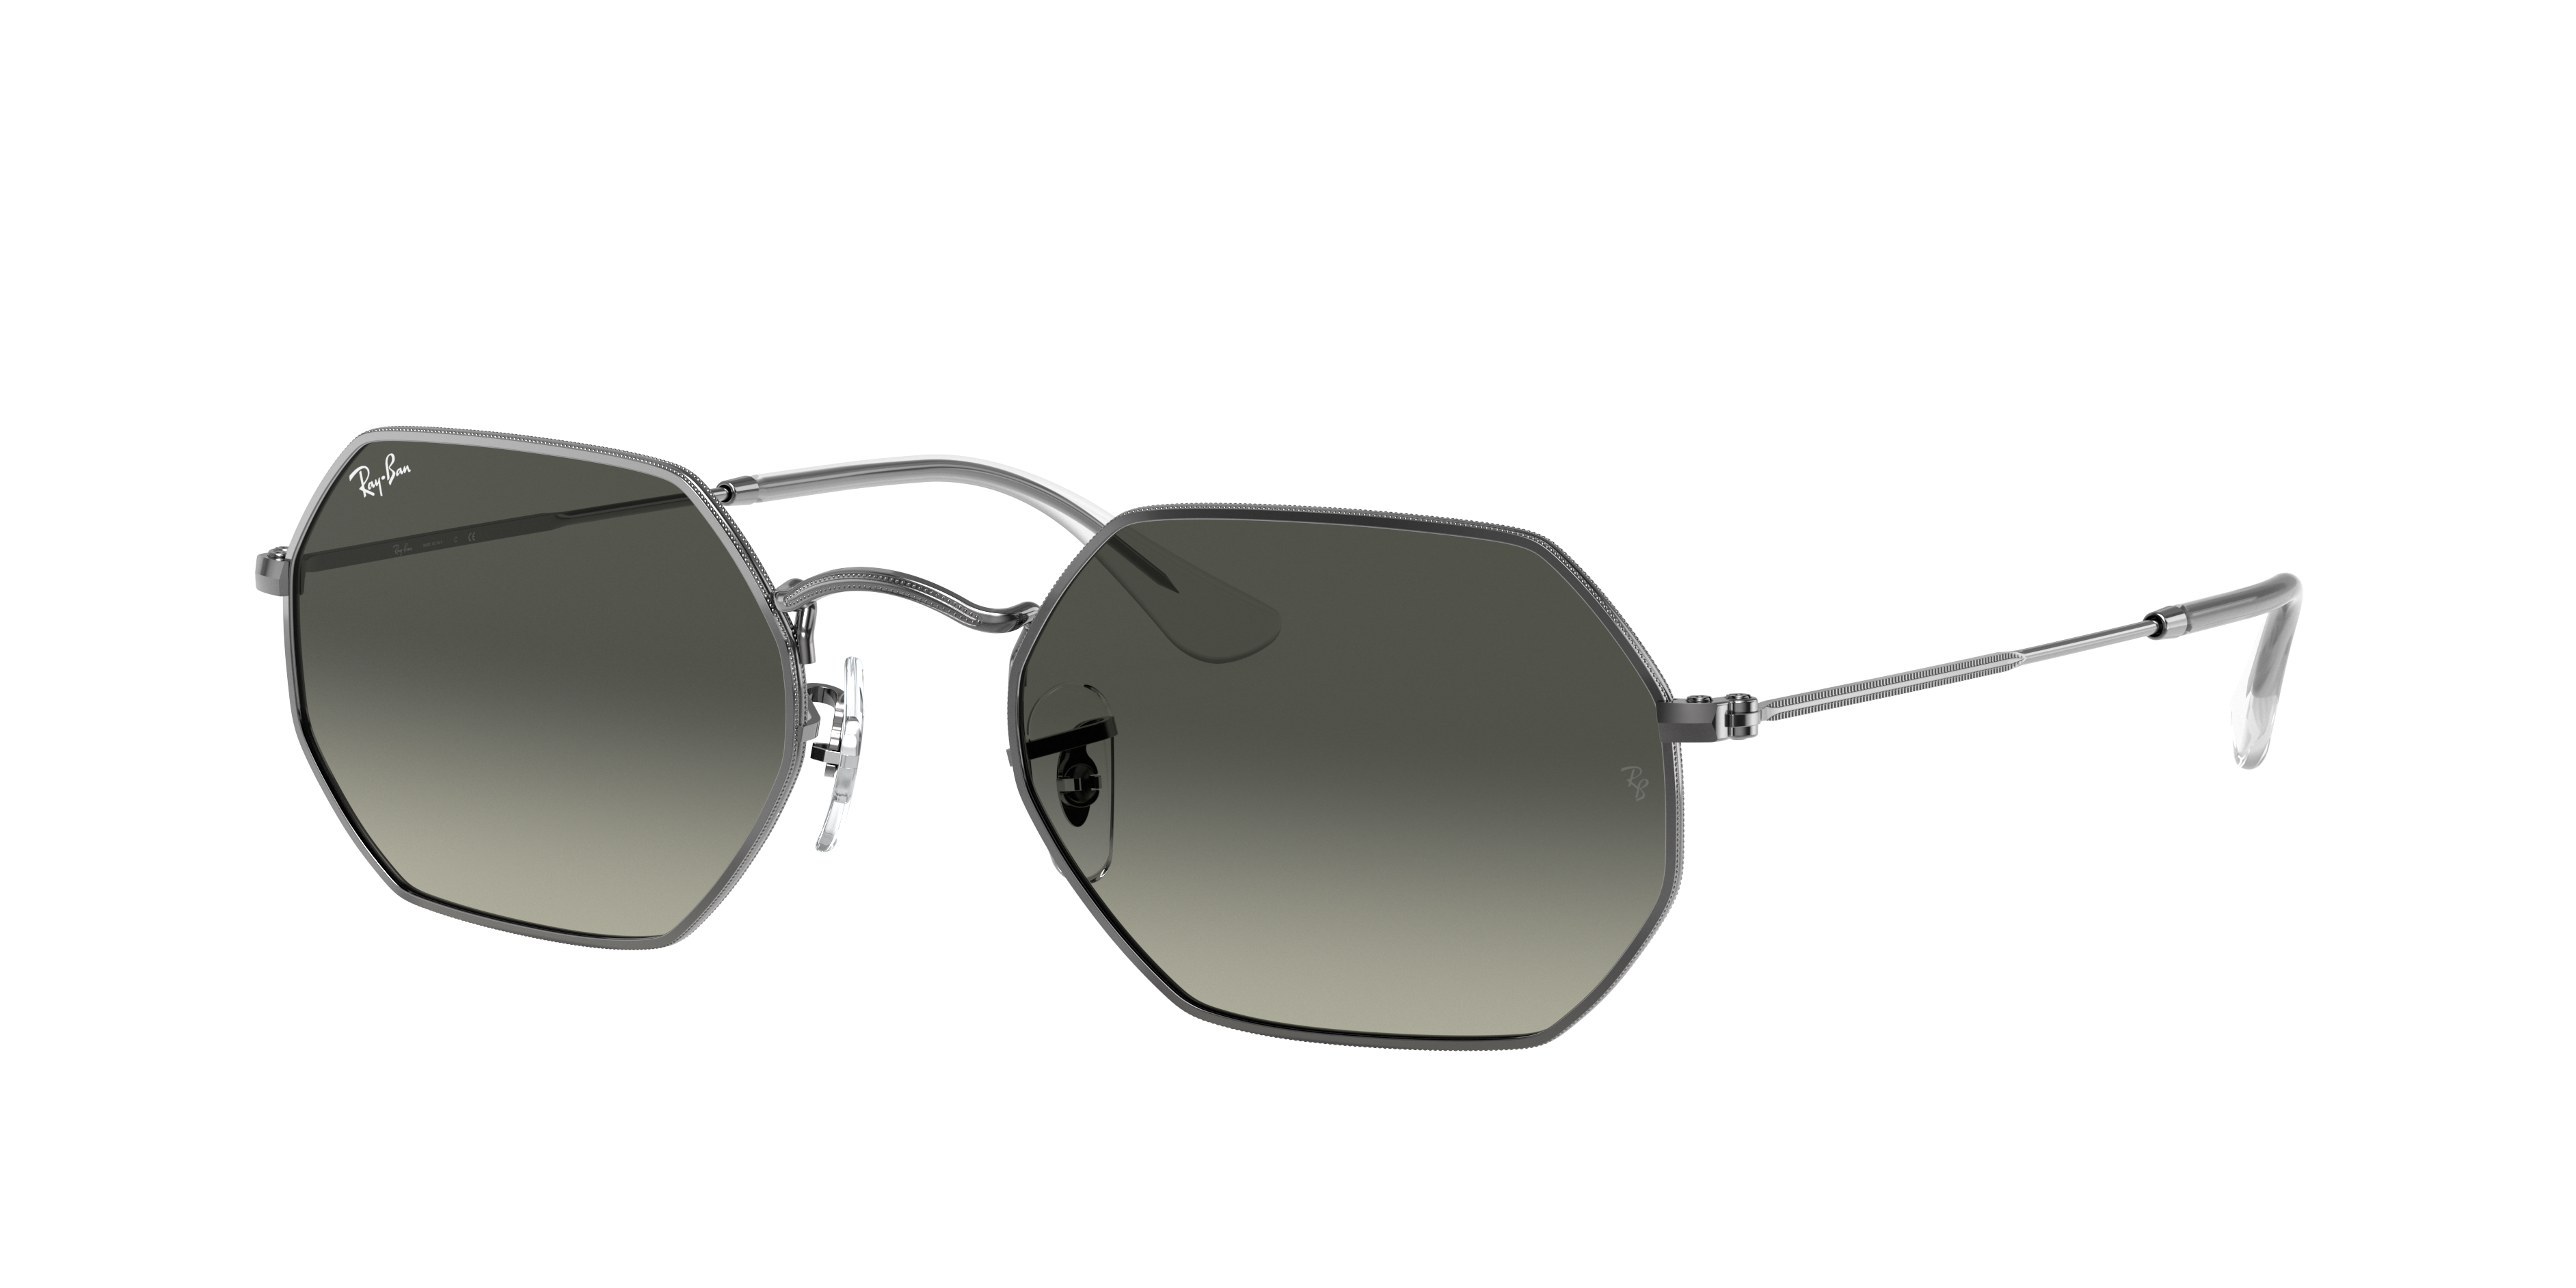 Ray-Ban Octagonal Classic Gunmetal, Gray Lenses - RB3556N